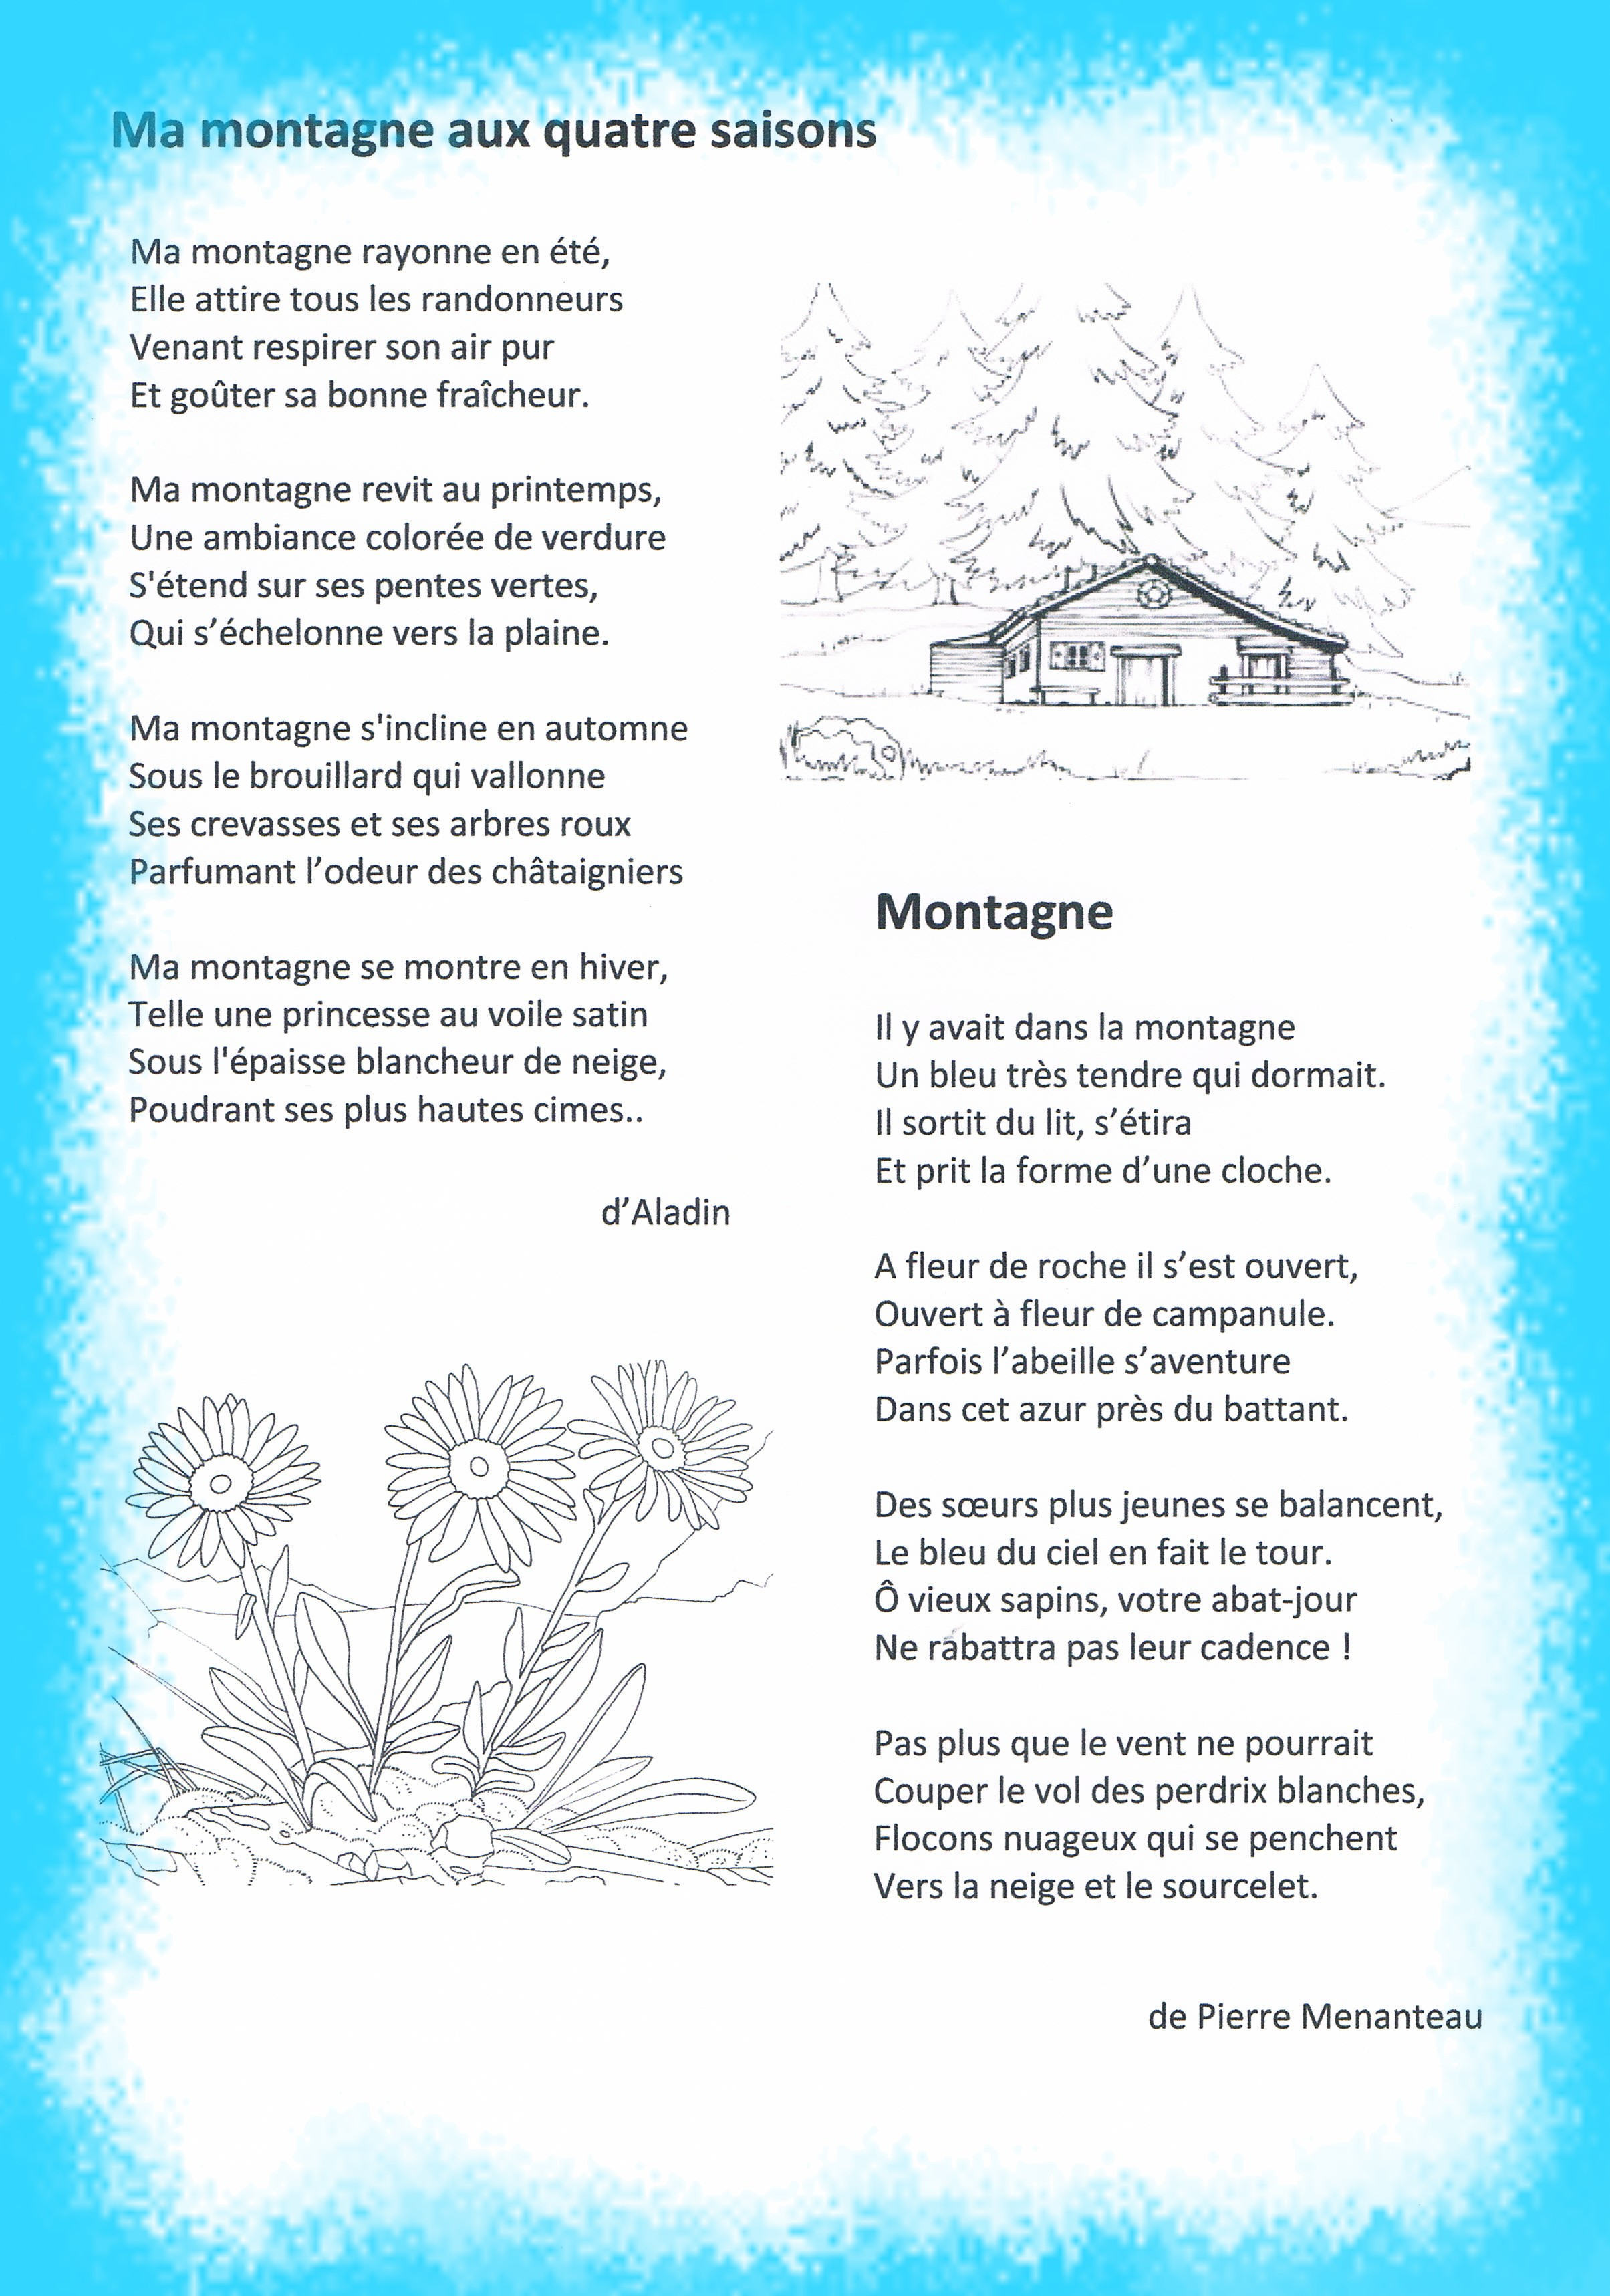 poesie montagne